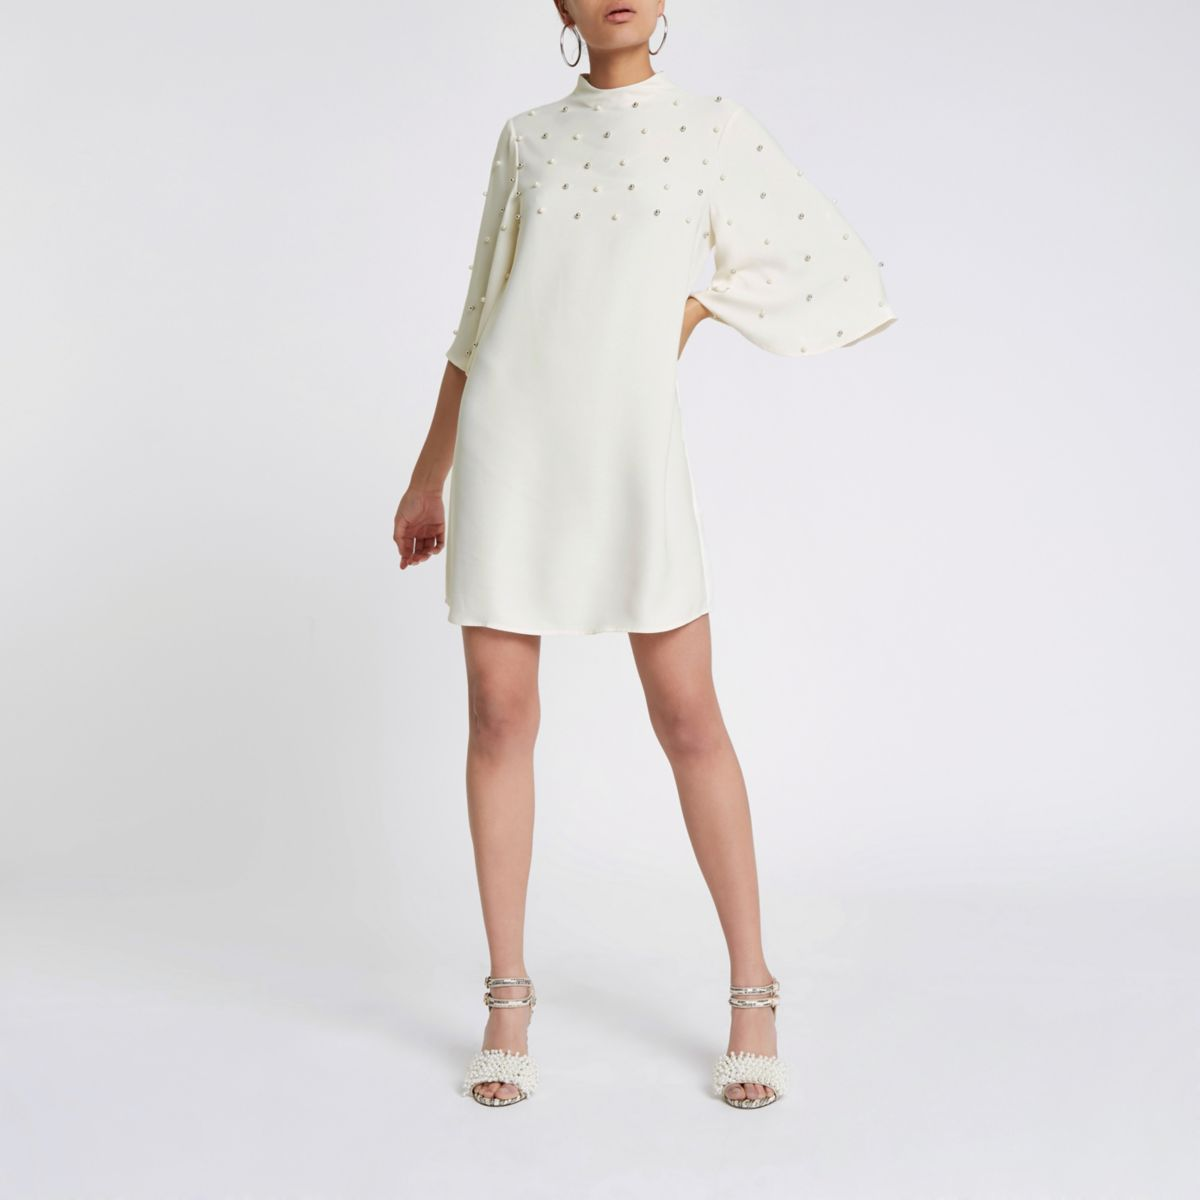 Cream satin faux pearl swing dress